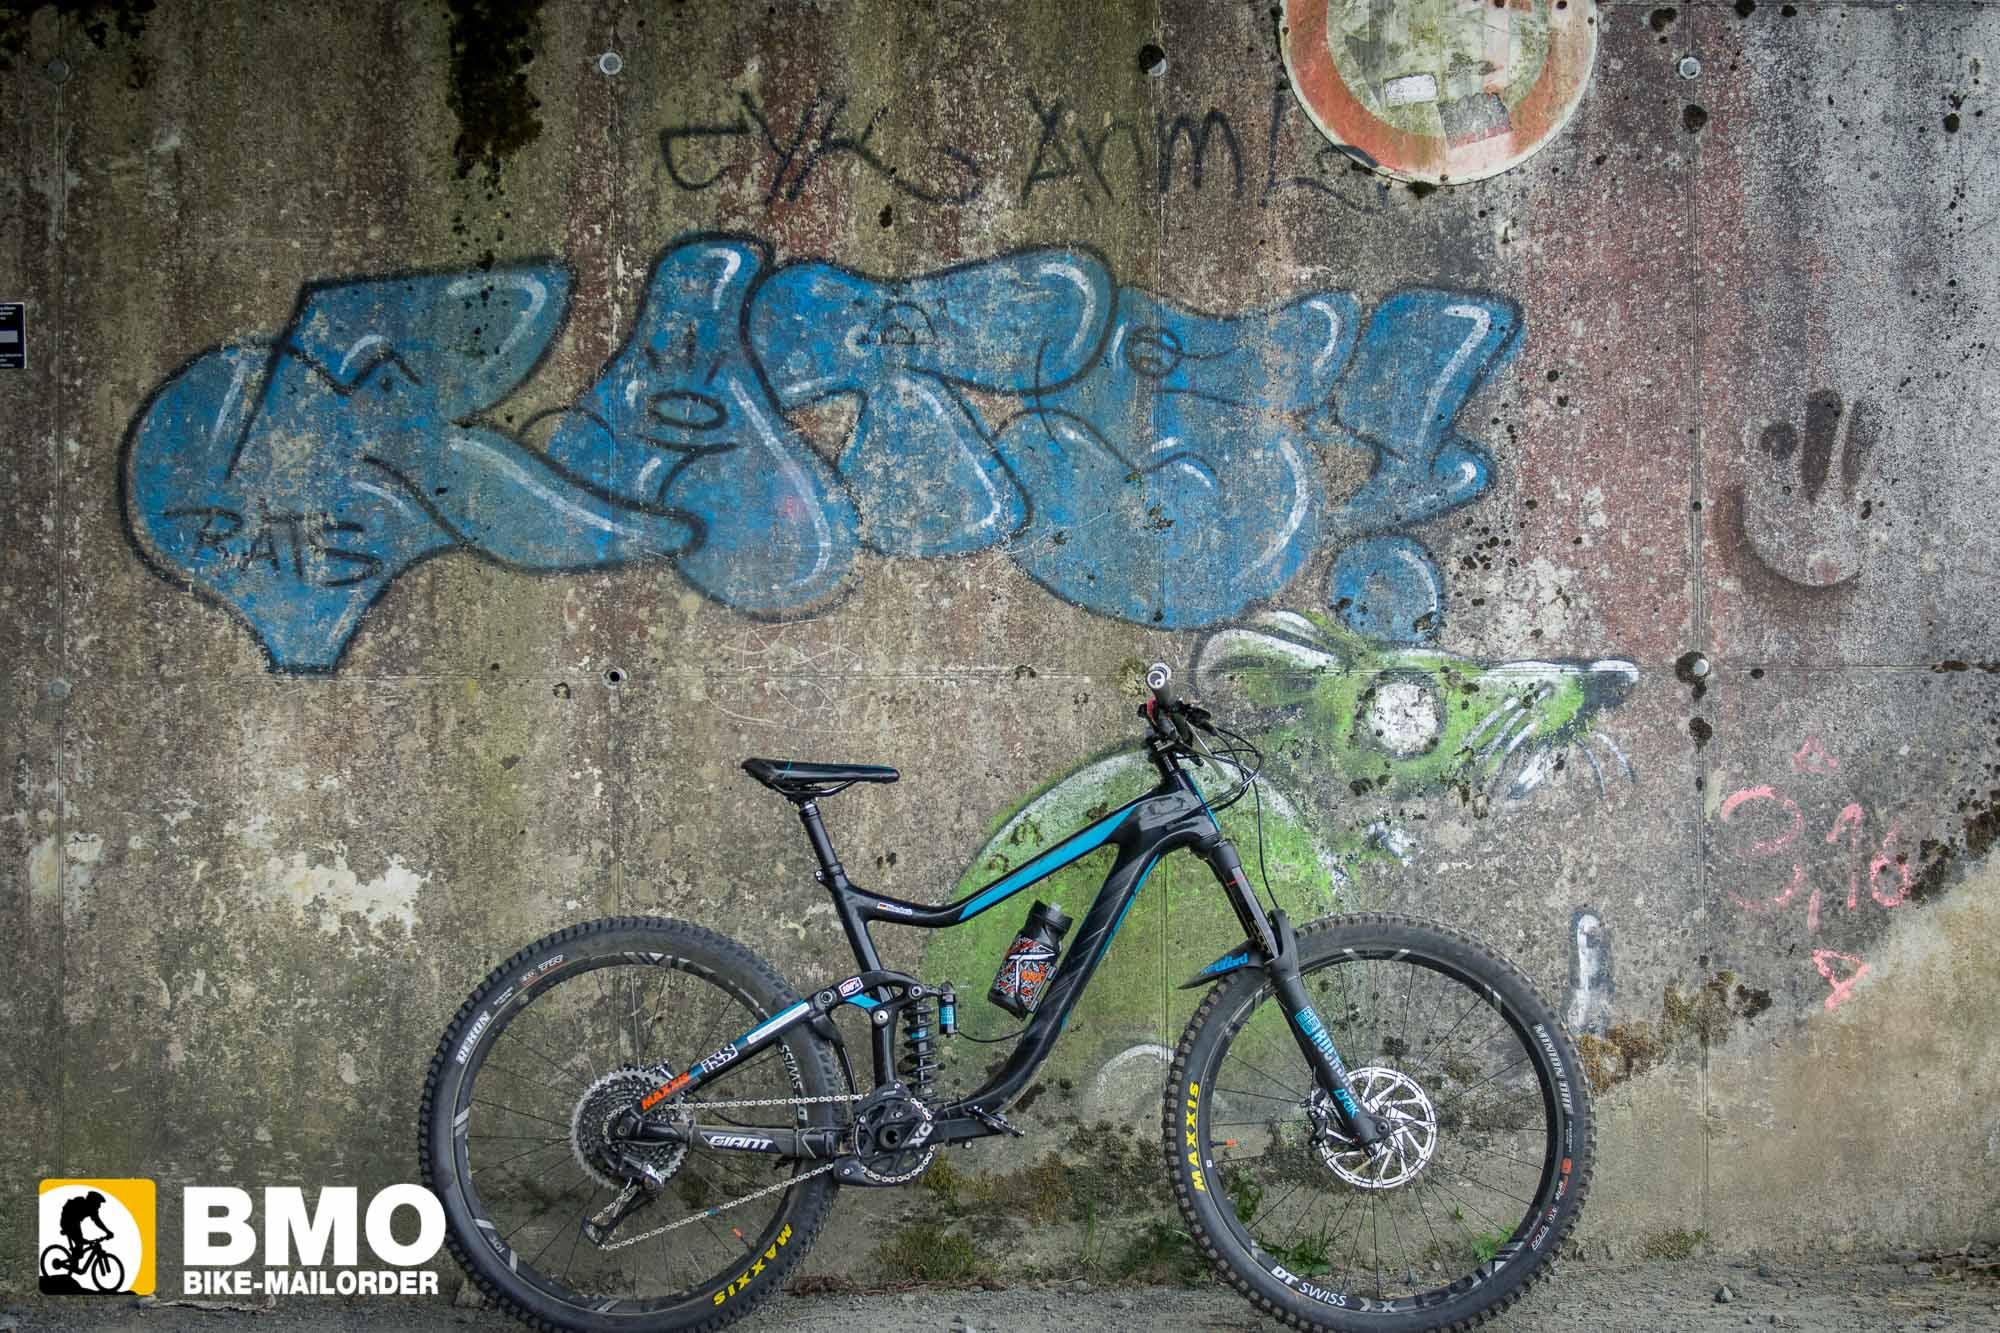 giant_bikemailorder-4